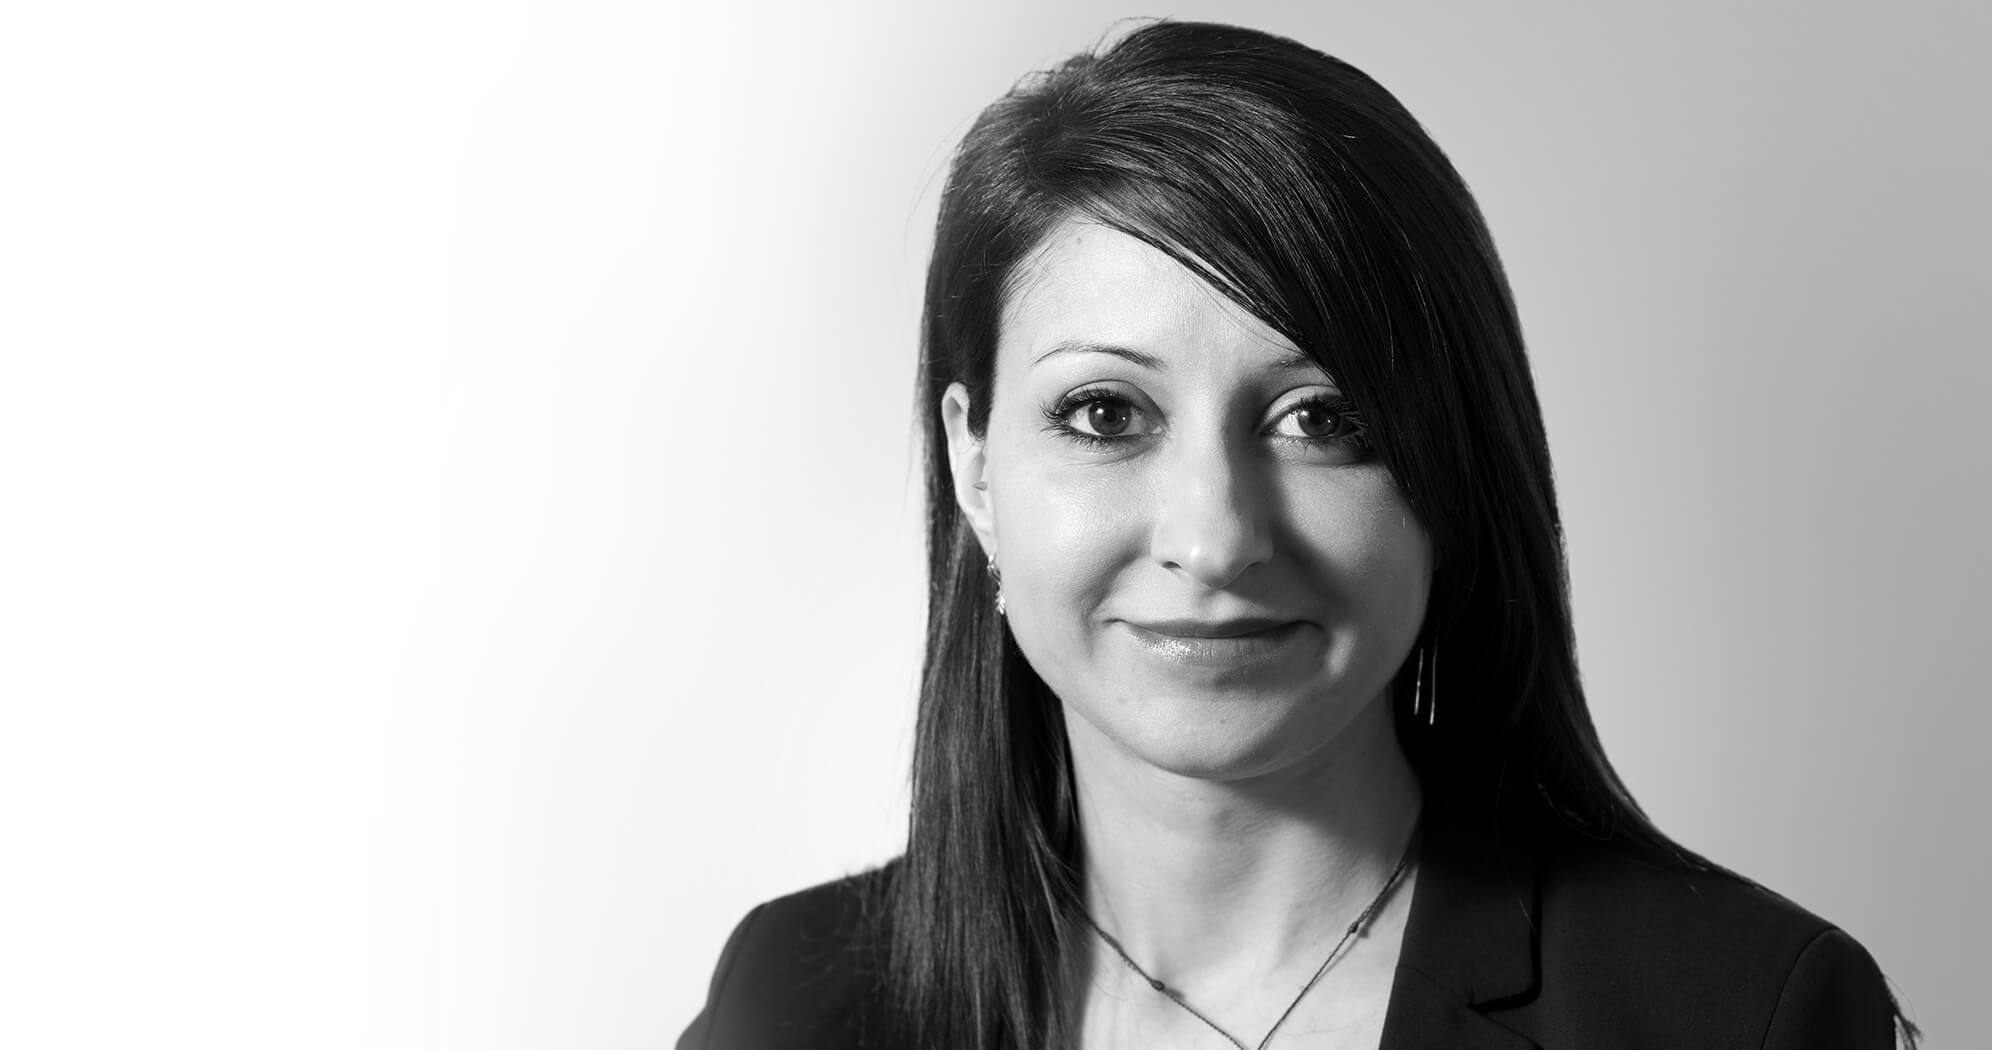 Francesca Quacquarelli